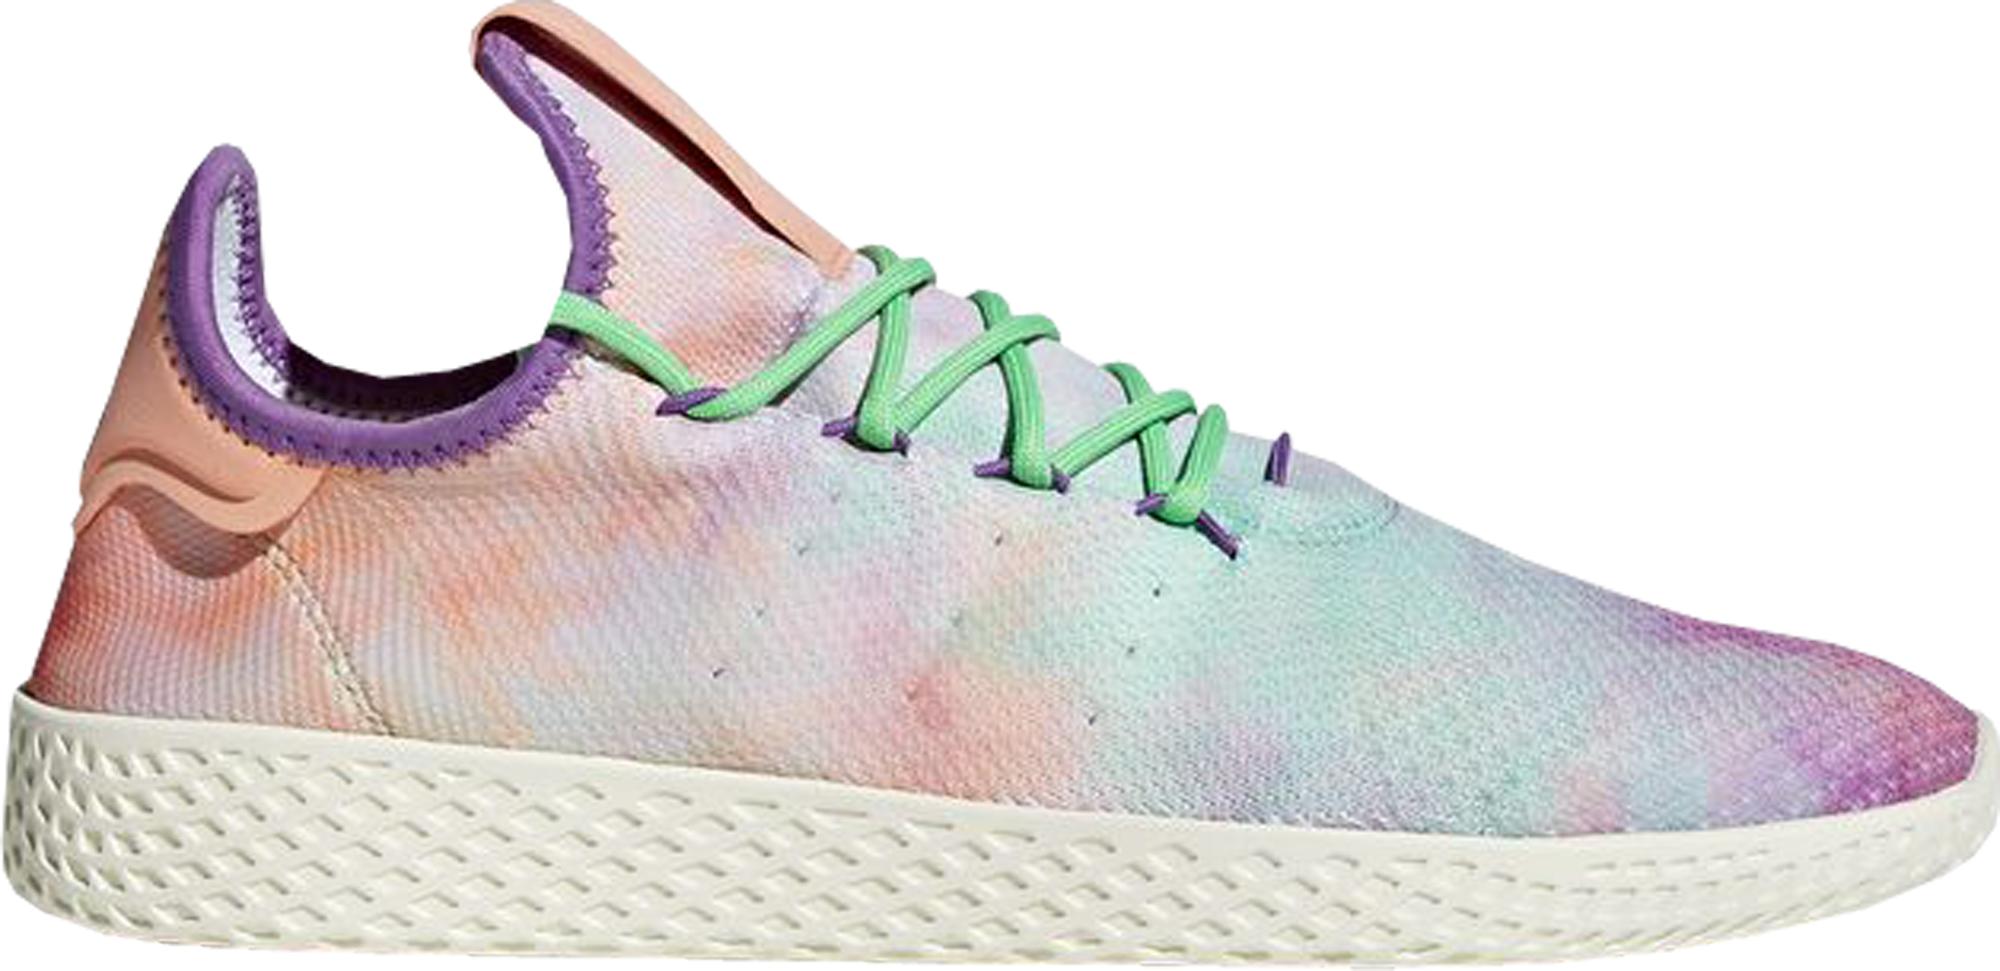 adidas Tennis HU Pharrell Holi Tie Dye